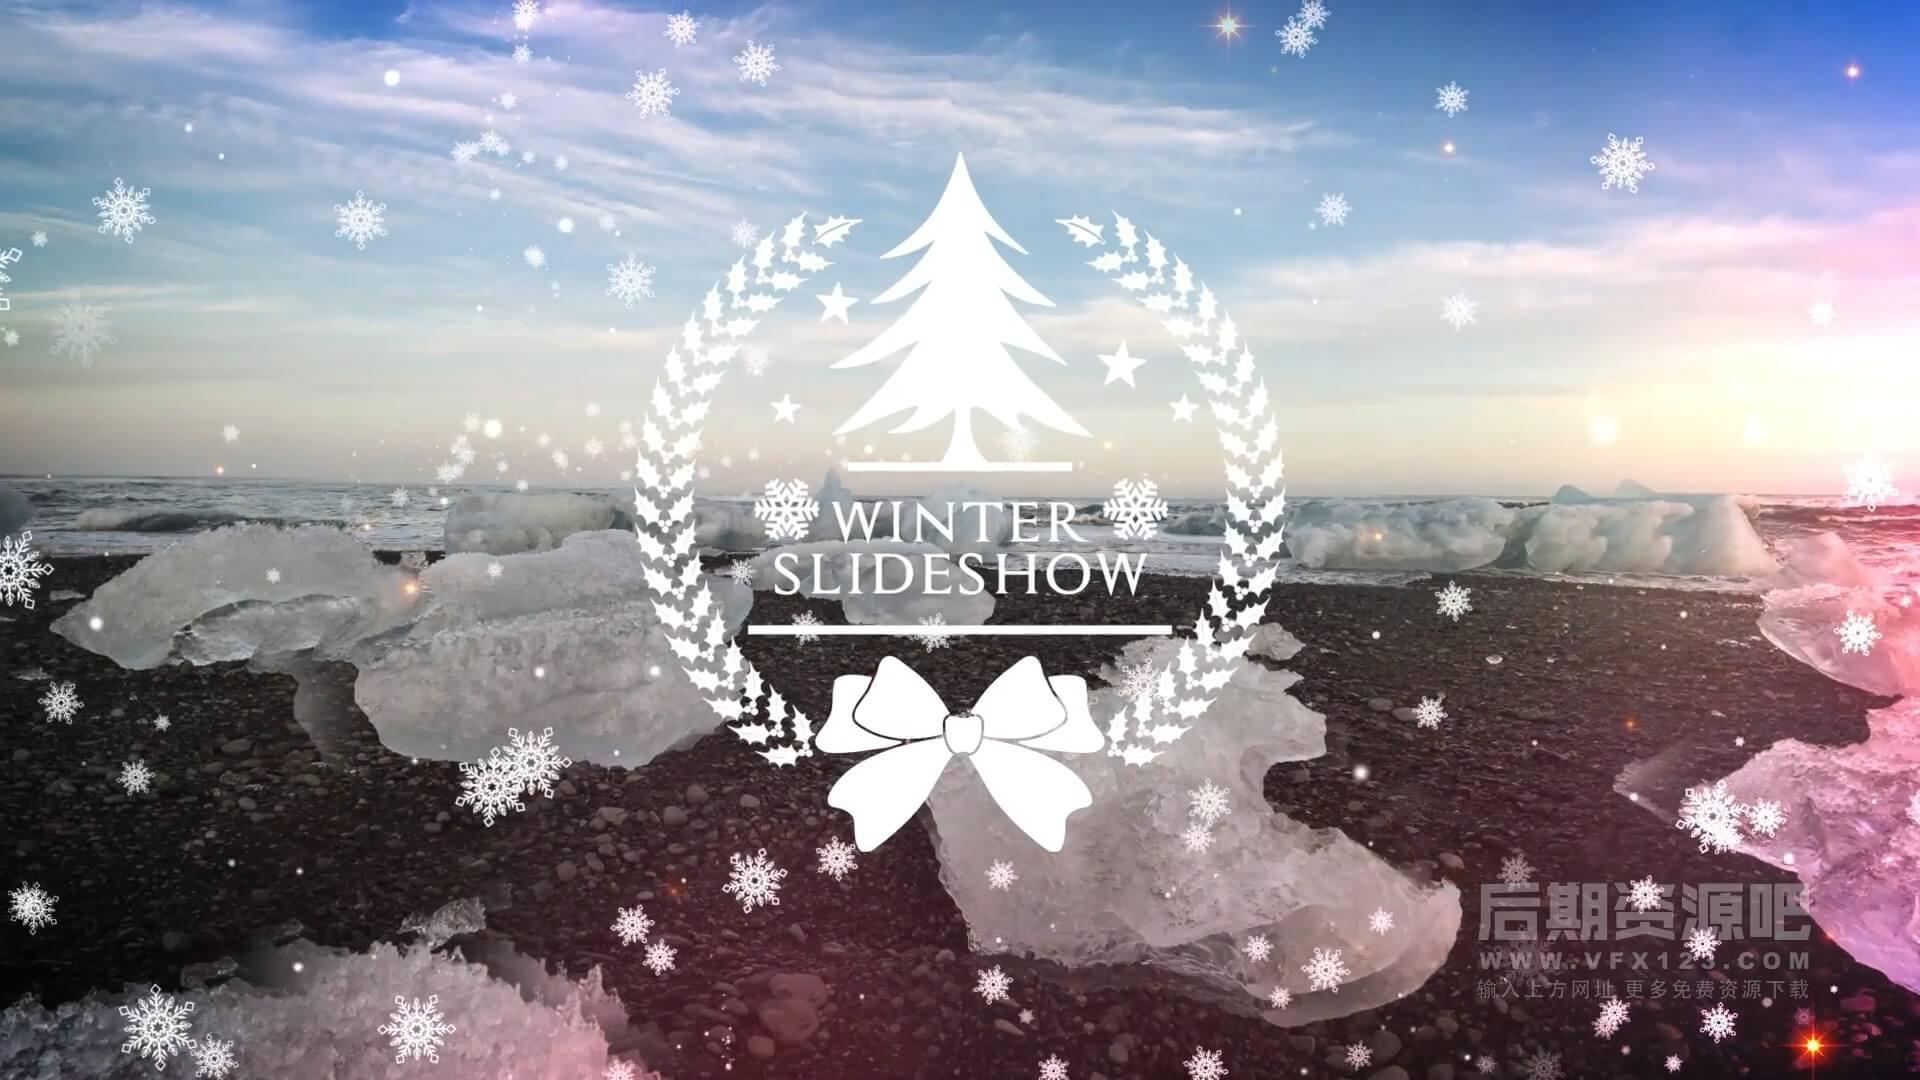 fcpx插件 圣诞节假日祝福图文展示片头模板 Winter Slideshow